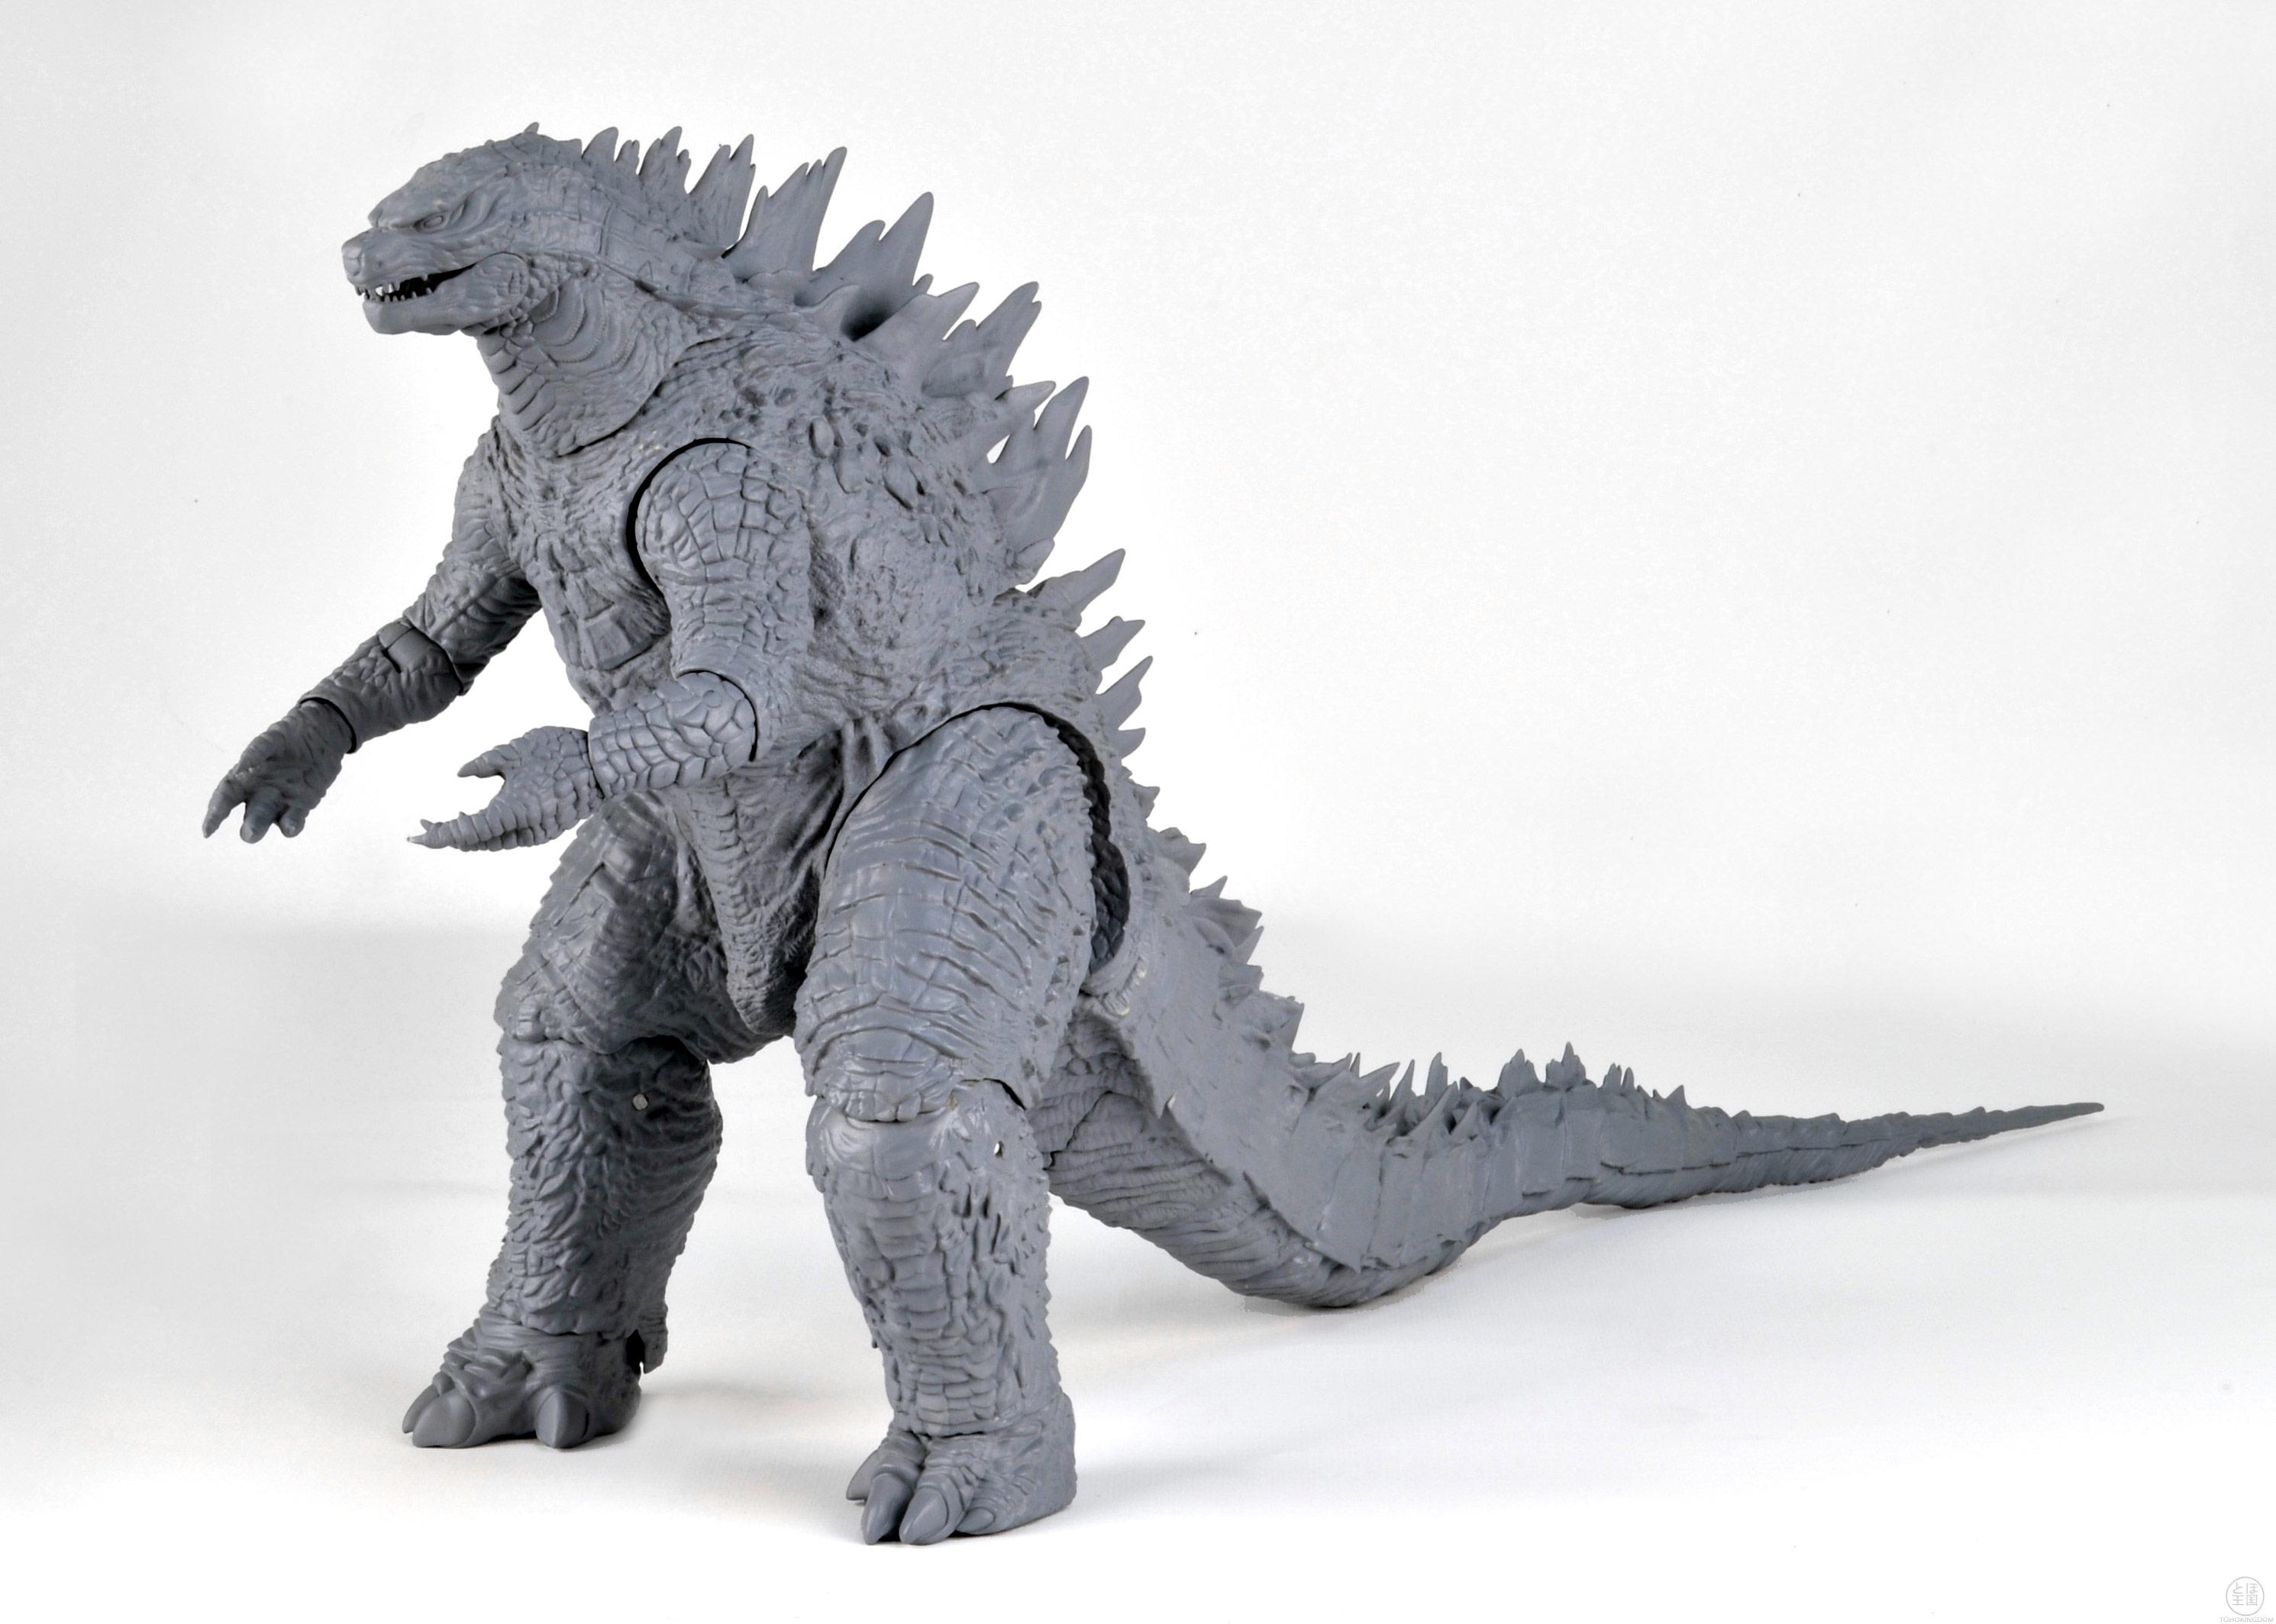 NECA Godzilla 12-Inch and 24-Inch Prototypes RevealedNeca Godzilla 2014 Action Figures